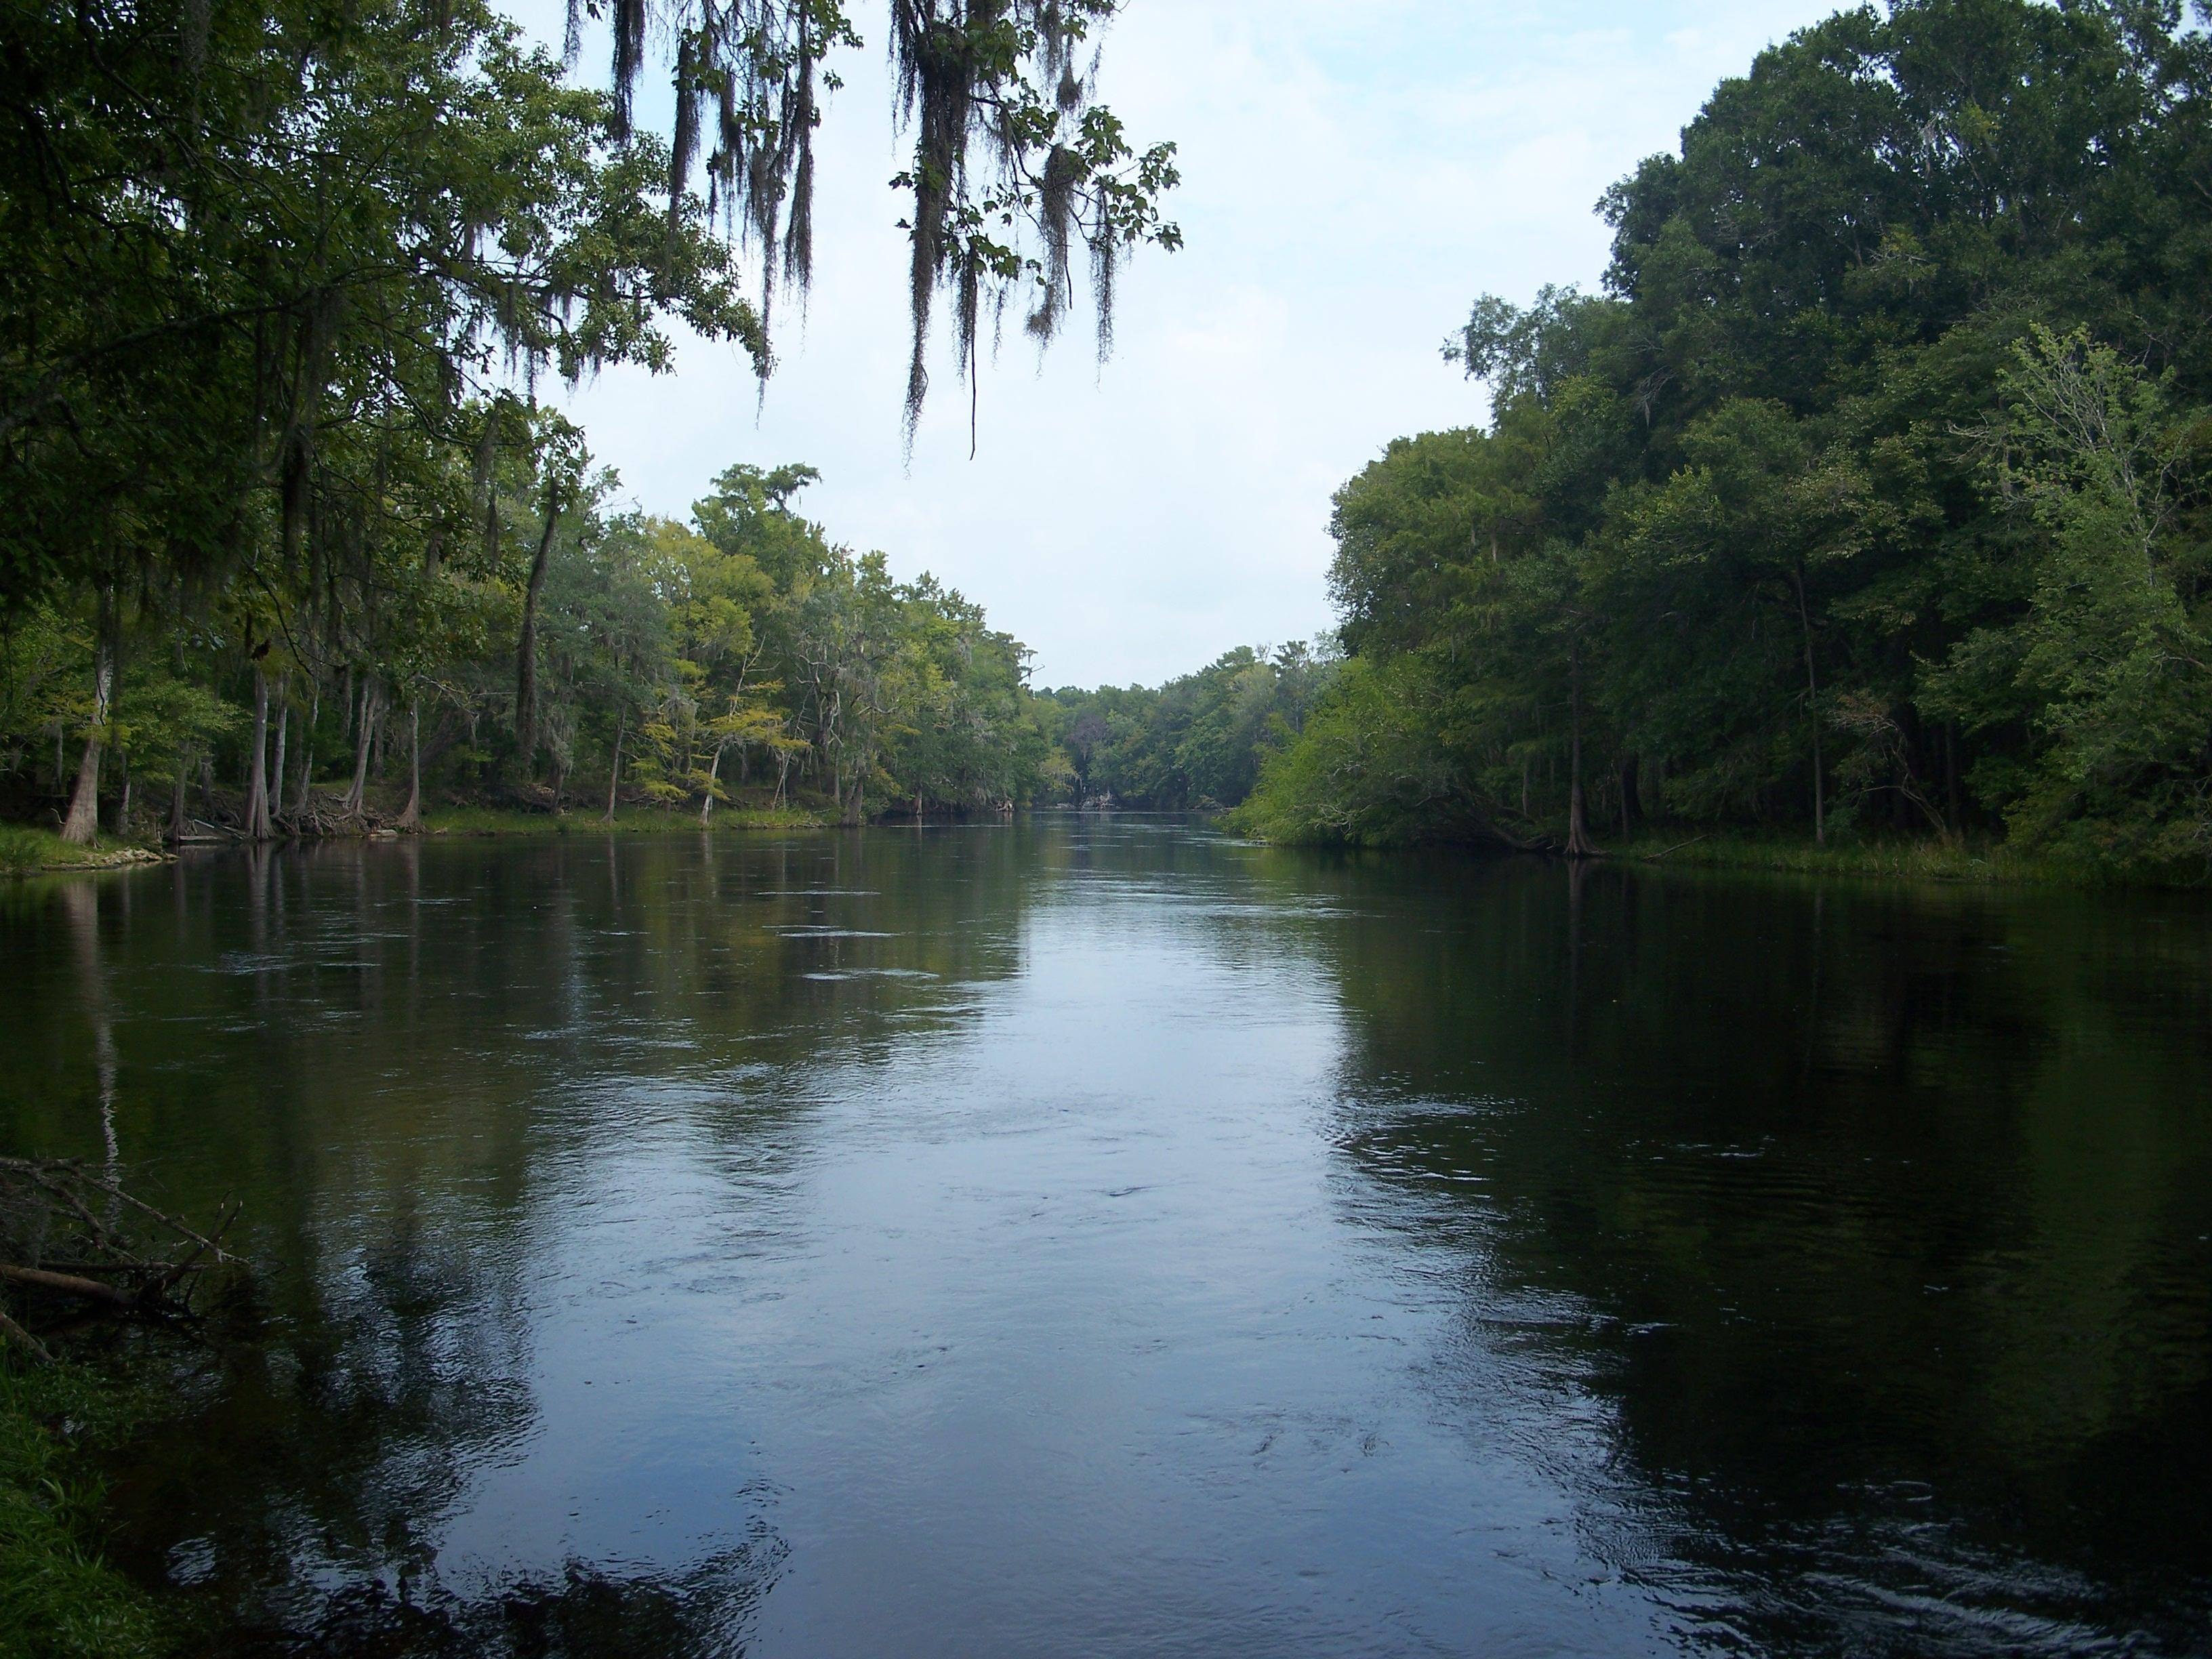 http://upload.wikimedia.org/wikipedia/commons/c/c3/CR_47_FL_Suwannee_River_north01.jpg